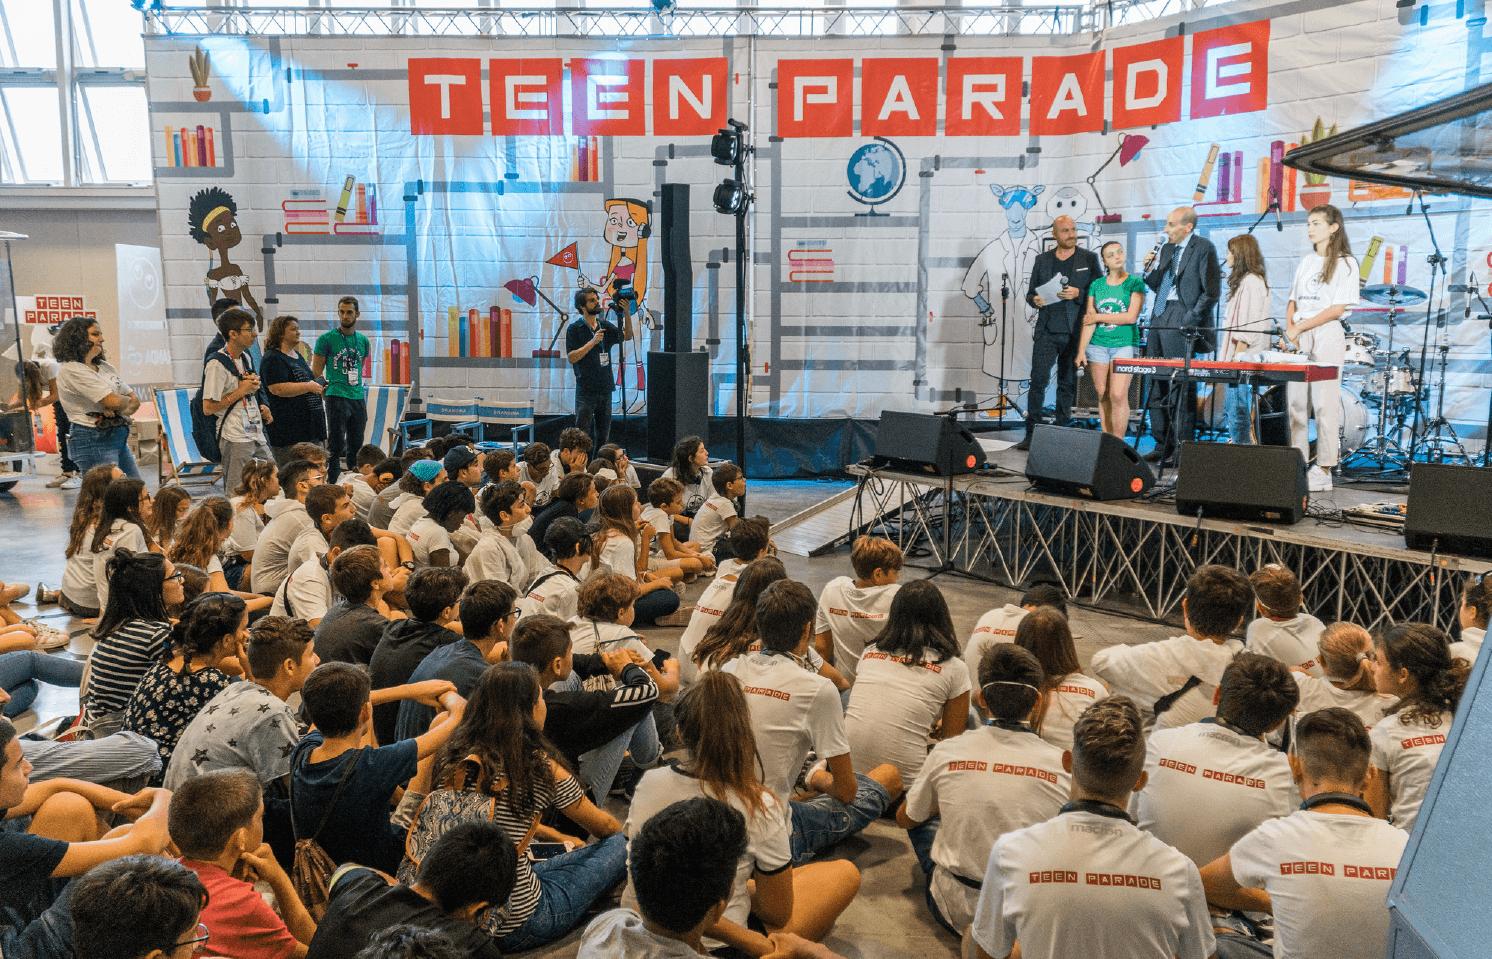 Teen Parade III edizione